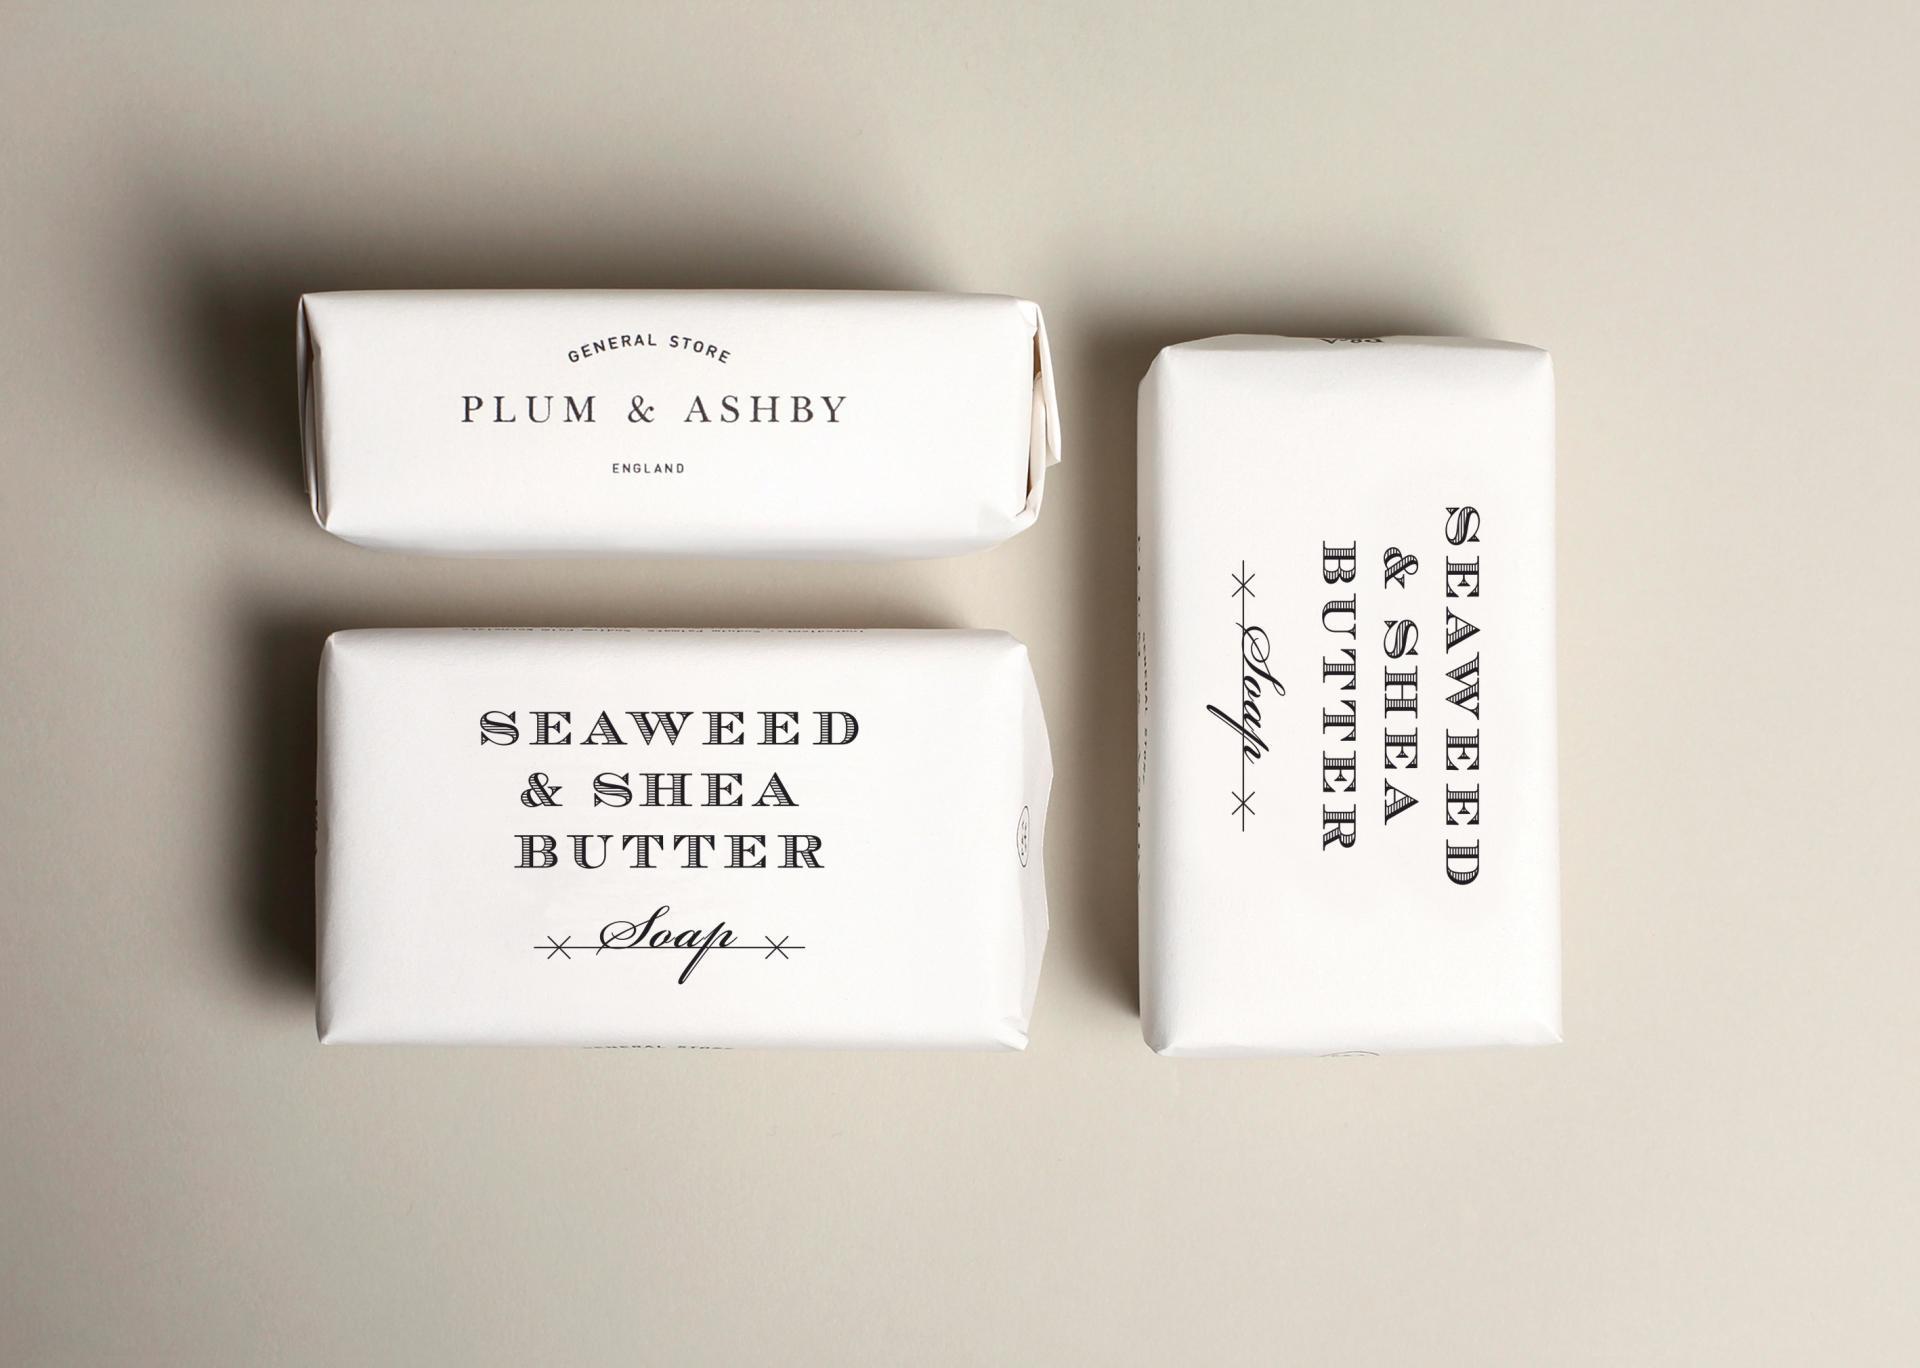 PLUM & ASHBY Mýdlo Seaweed & Shea butter 200gr, bílá barva